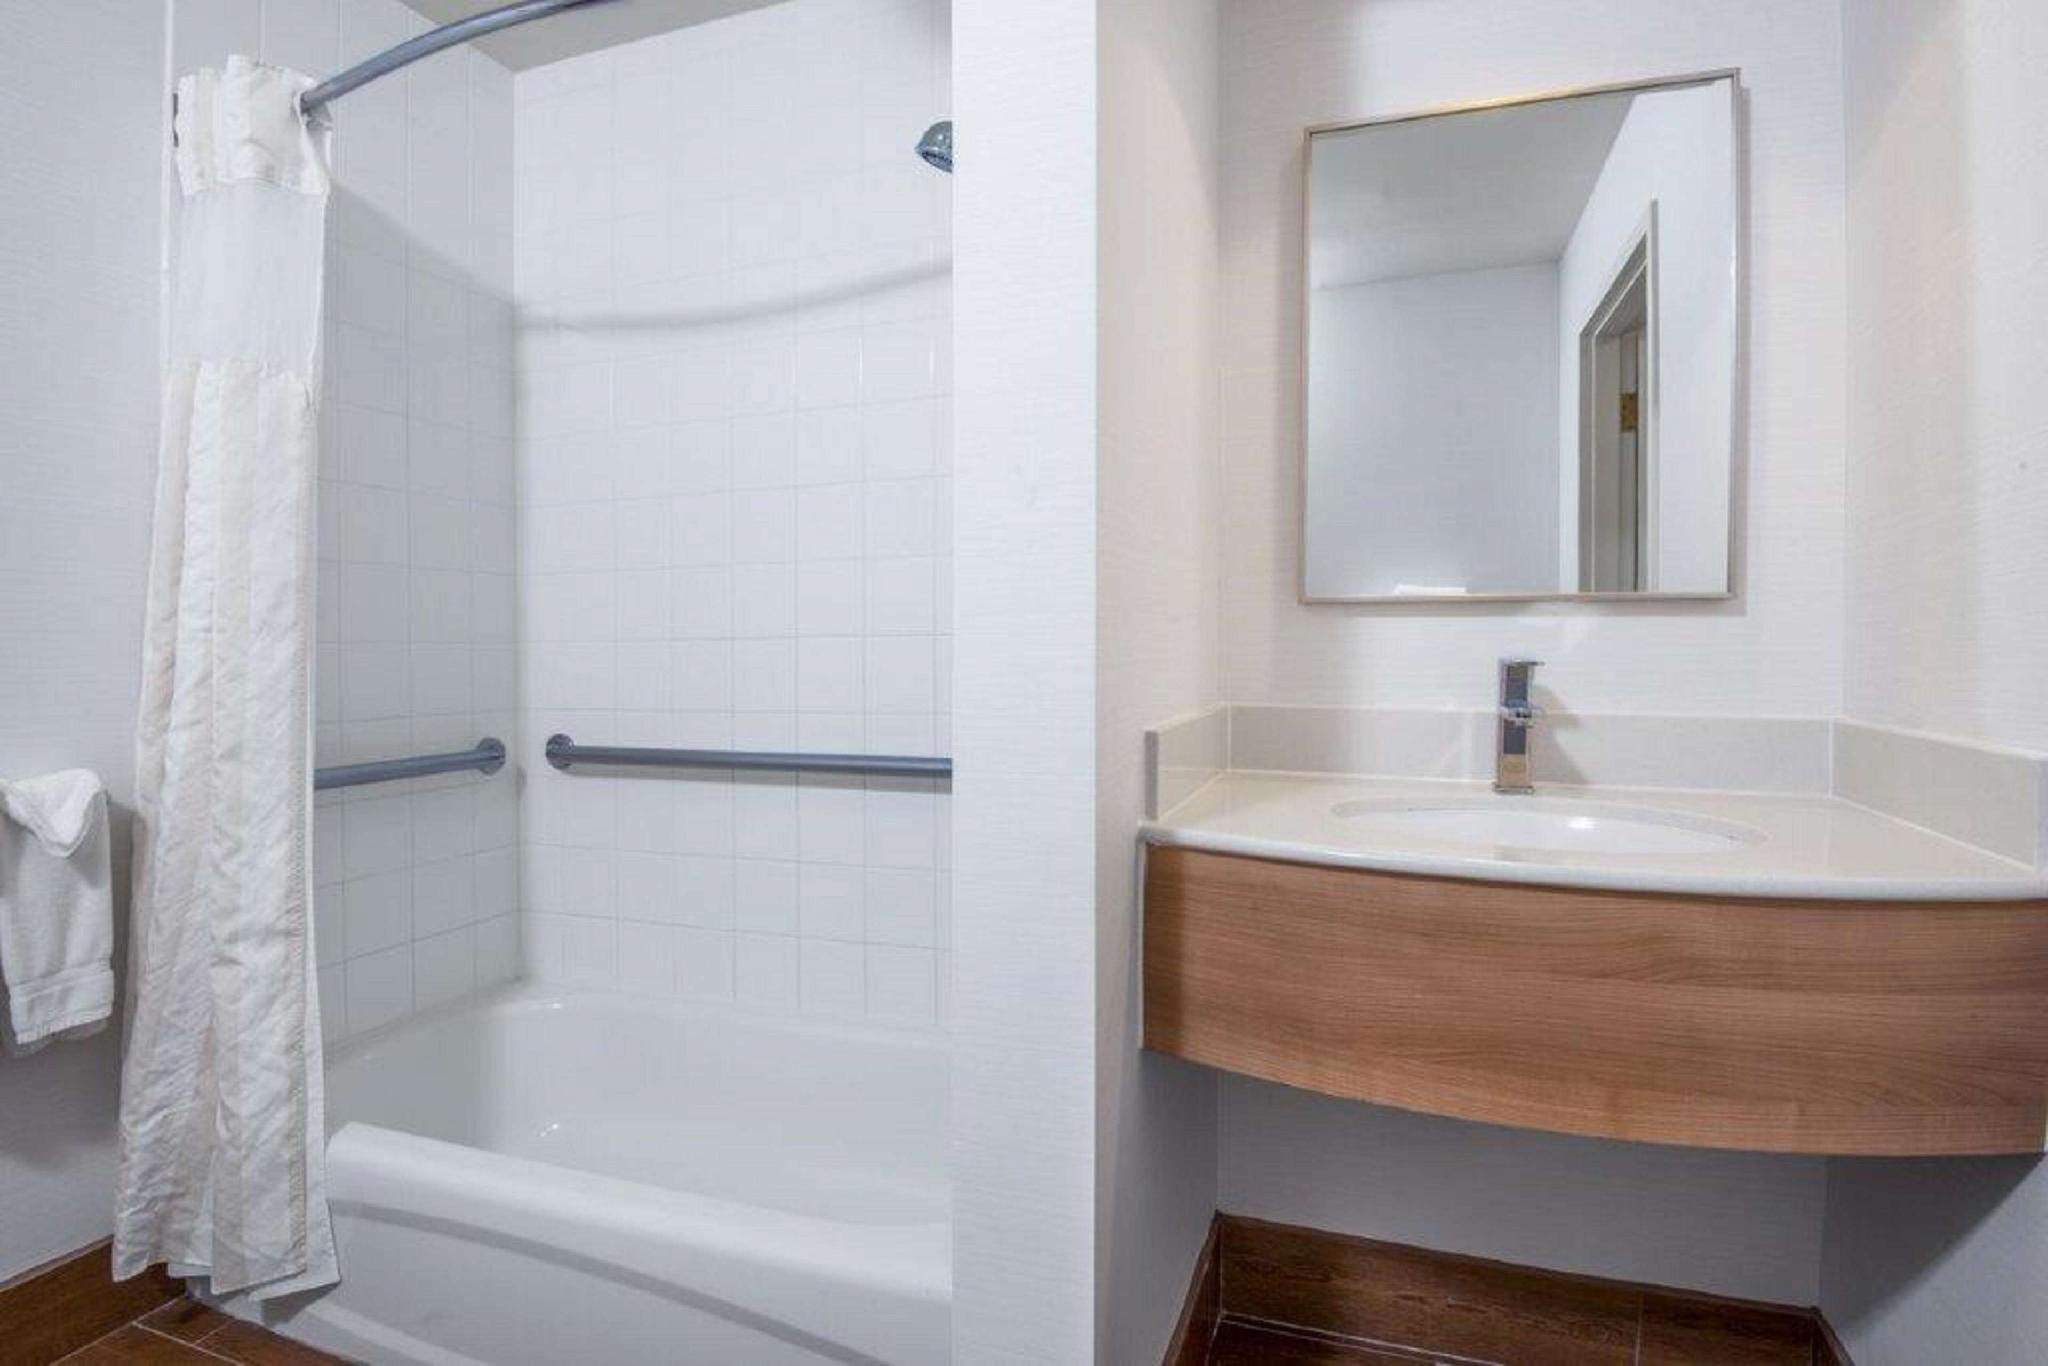 Hilton Garden Inn Wichita Hotel Wichita Ks Deals Photos Reviews